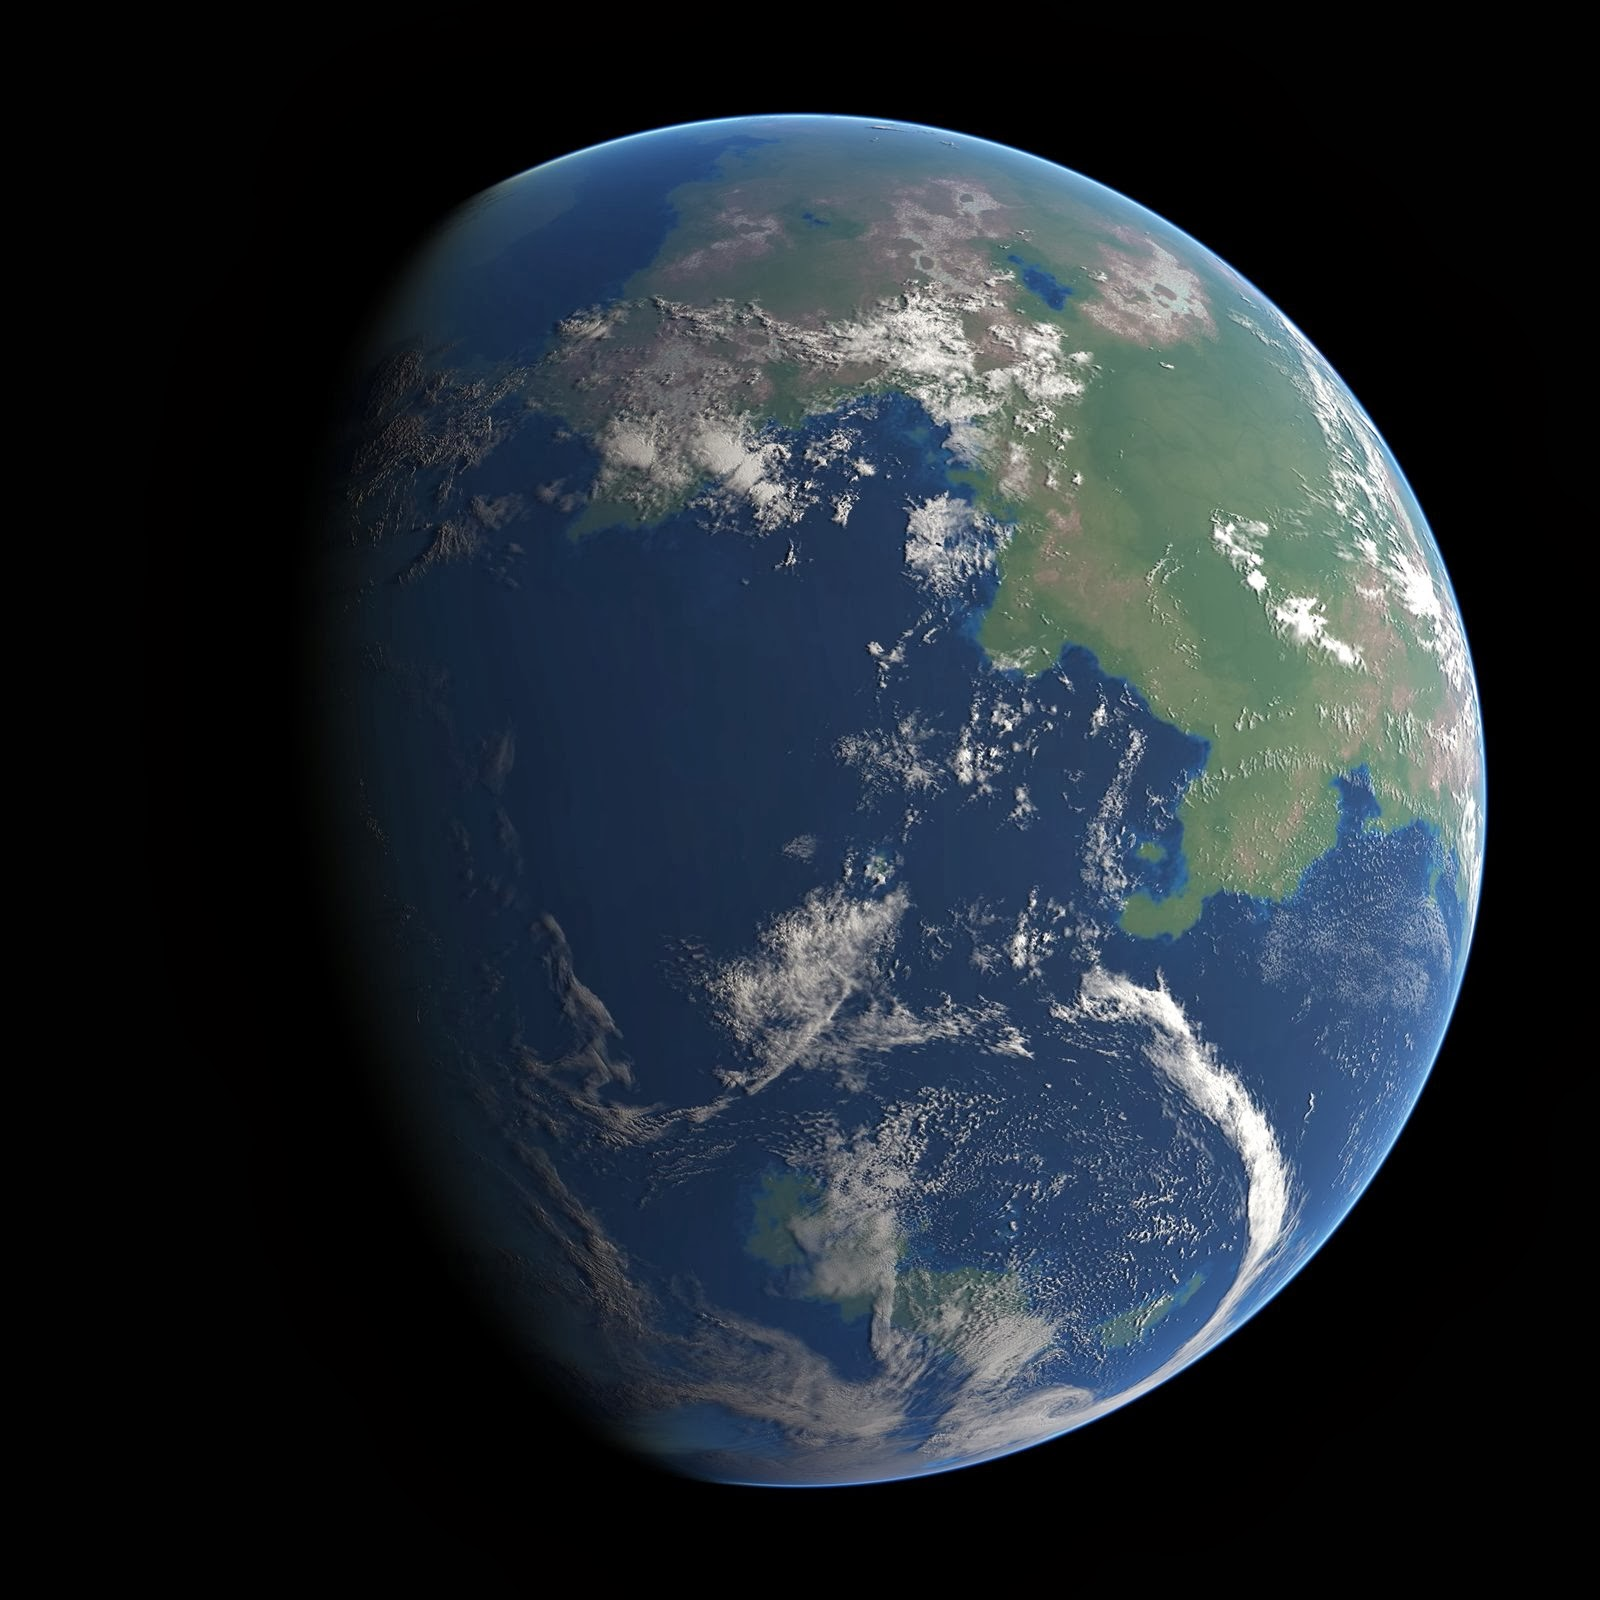 Beyond Earthly Skies: Habitability vs. Colonizability